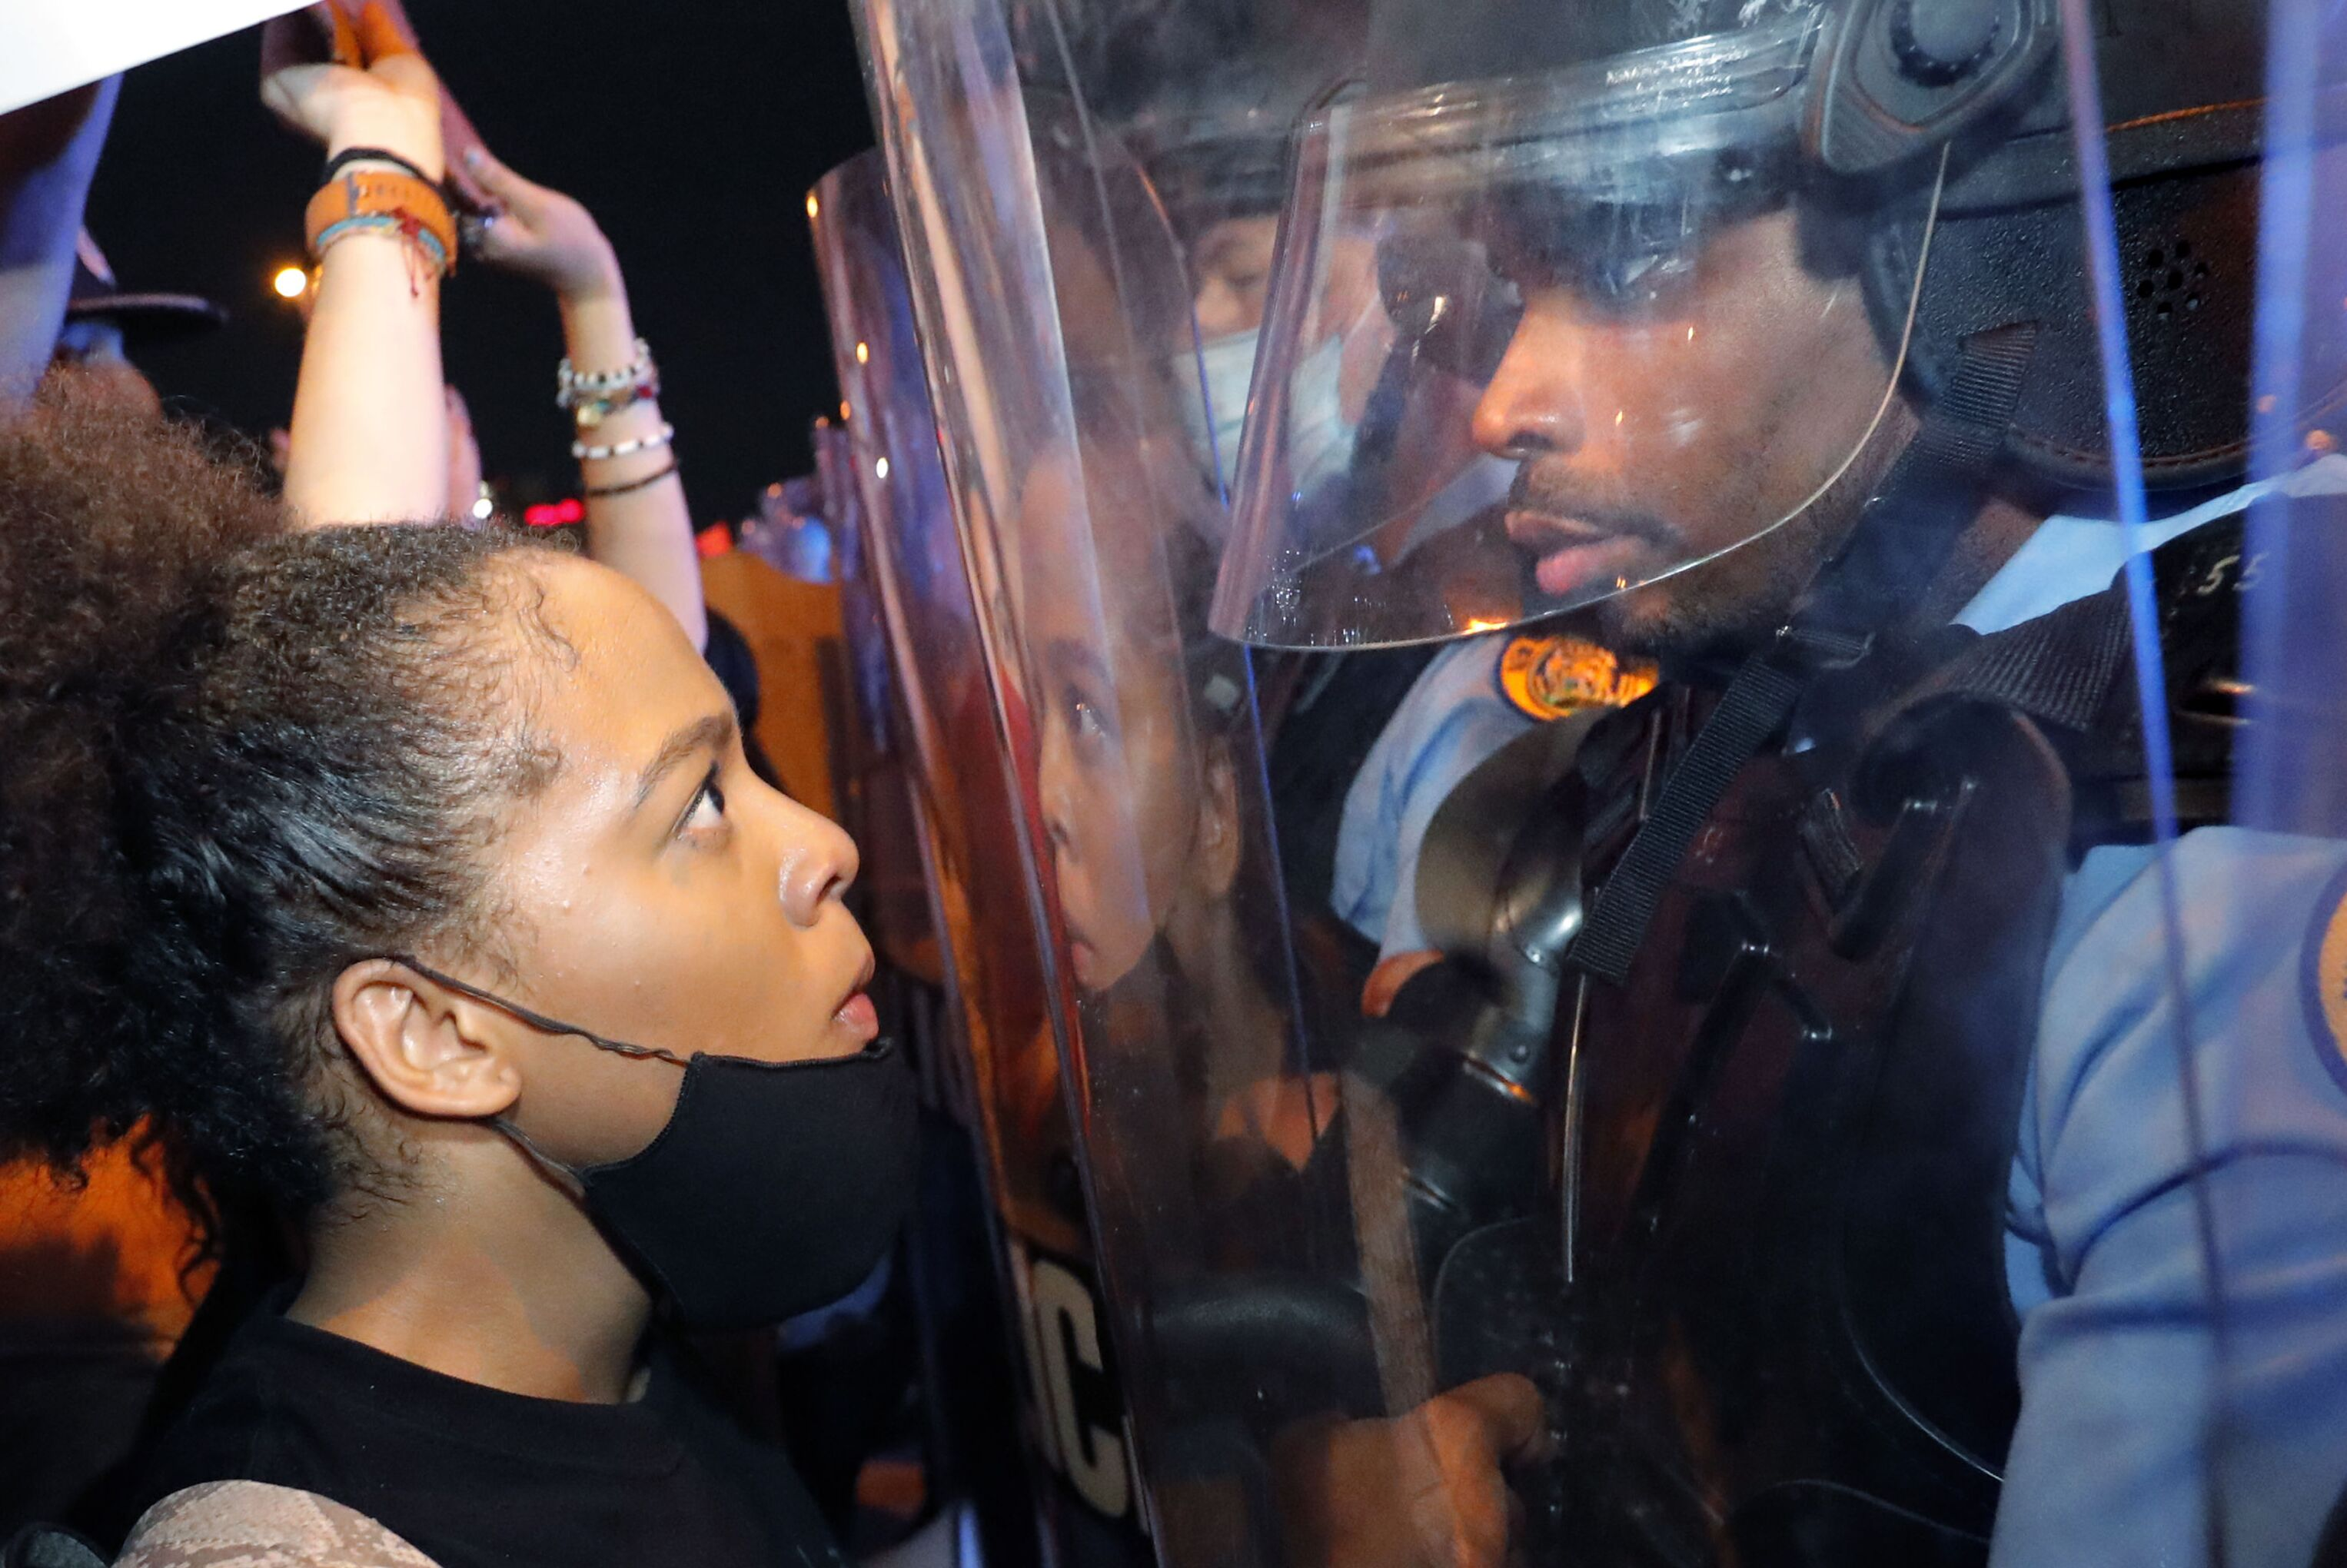 Manifestante encara policial durante protesto na cidade norte-americana de Nova Orleans, 3 de junho de 2020